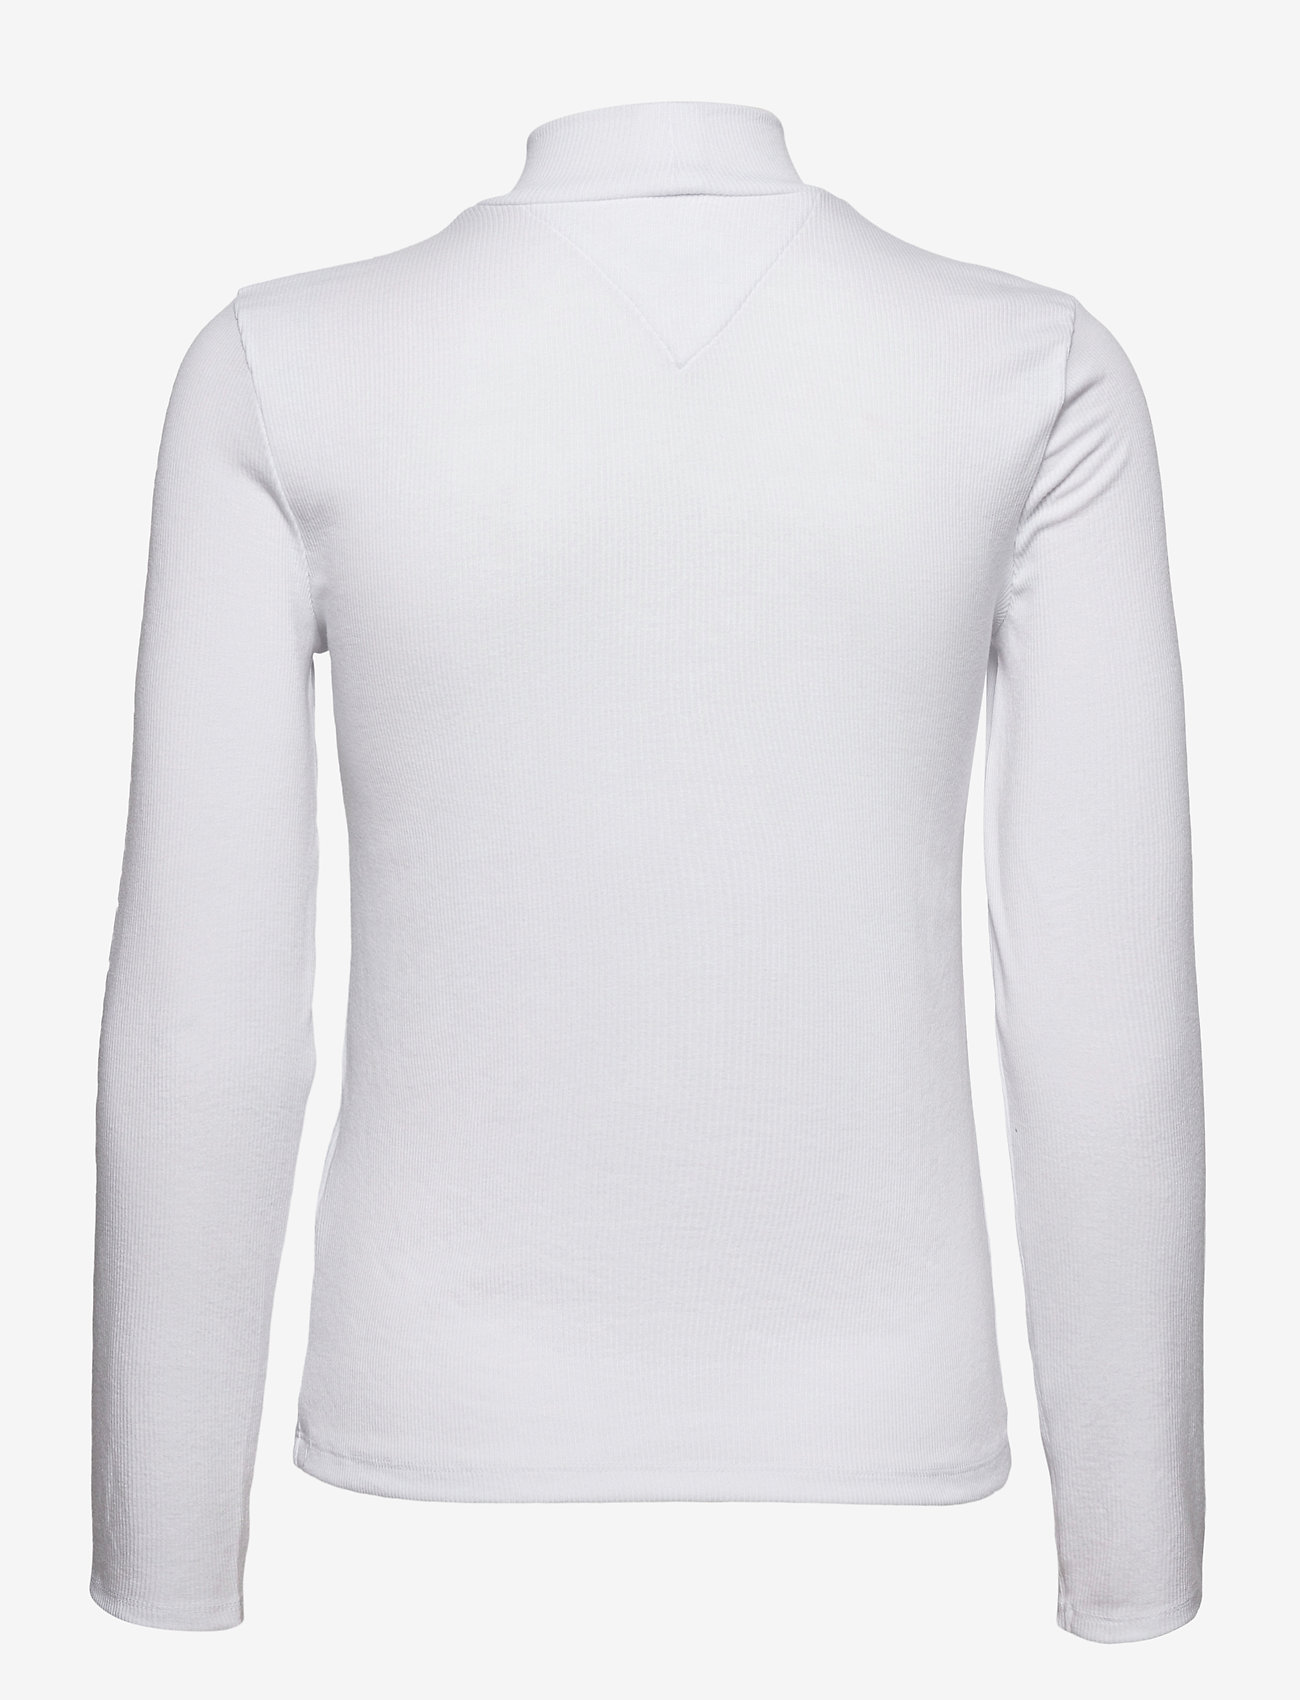 Tommy Jeans - TJW RIB MOCK NECK LONGSLEEVE - long-sleeved tops - white - 1